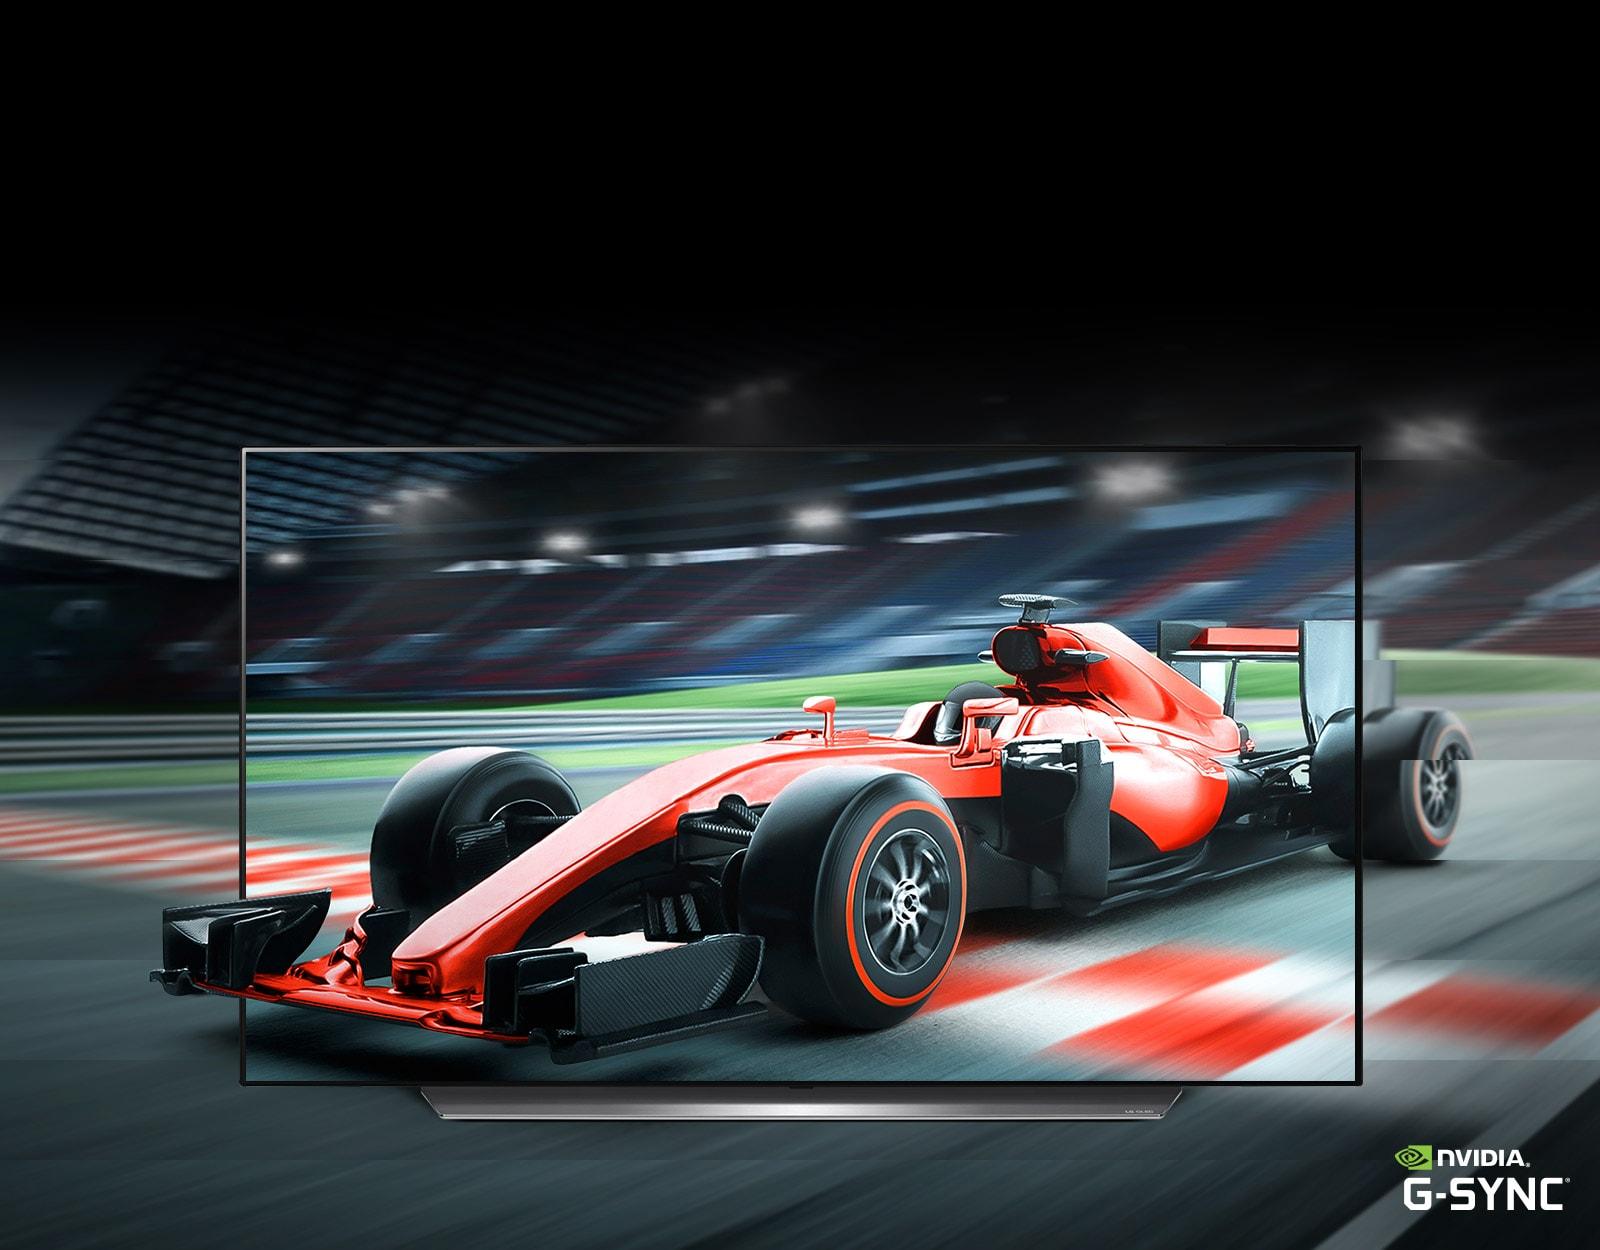 LG OLED TV - A PC Gamers Dream Come True